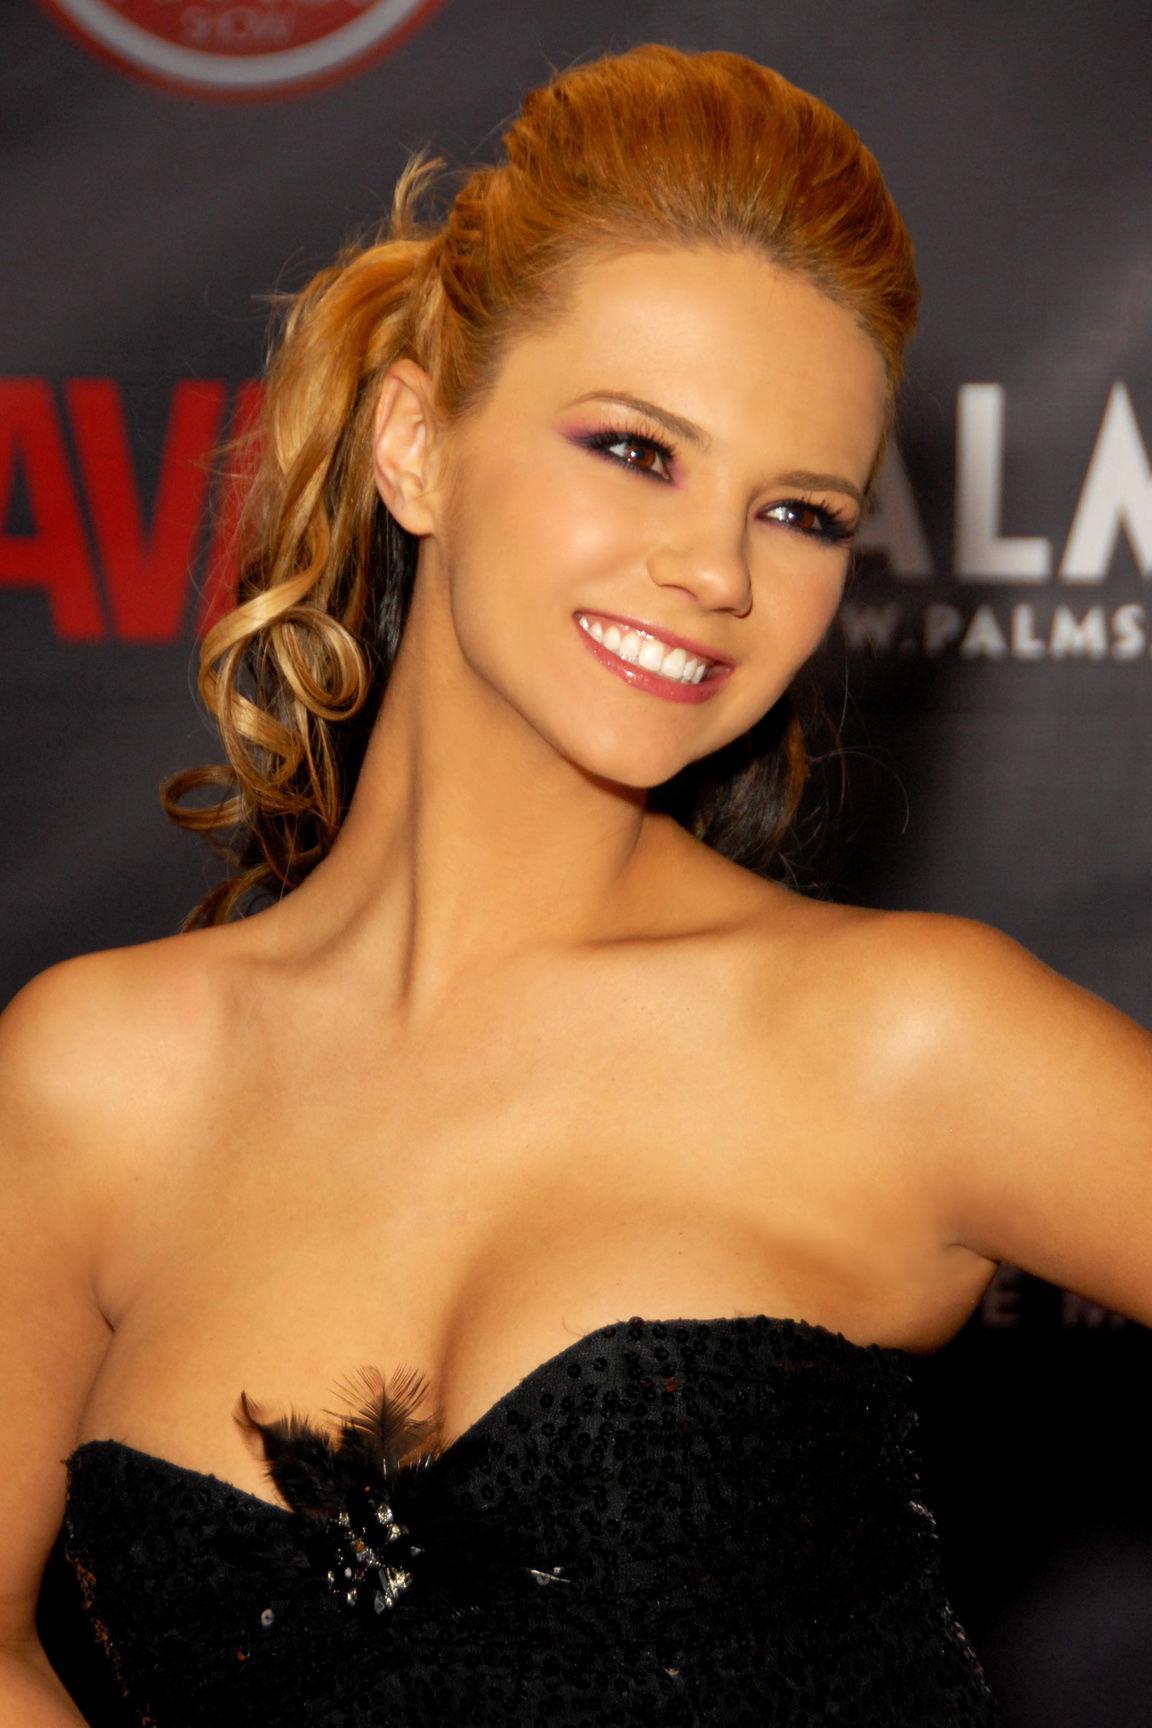 Photo of Ashlynn Brooke: American pornographic actress